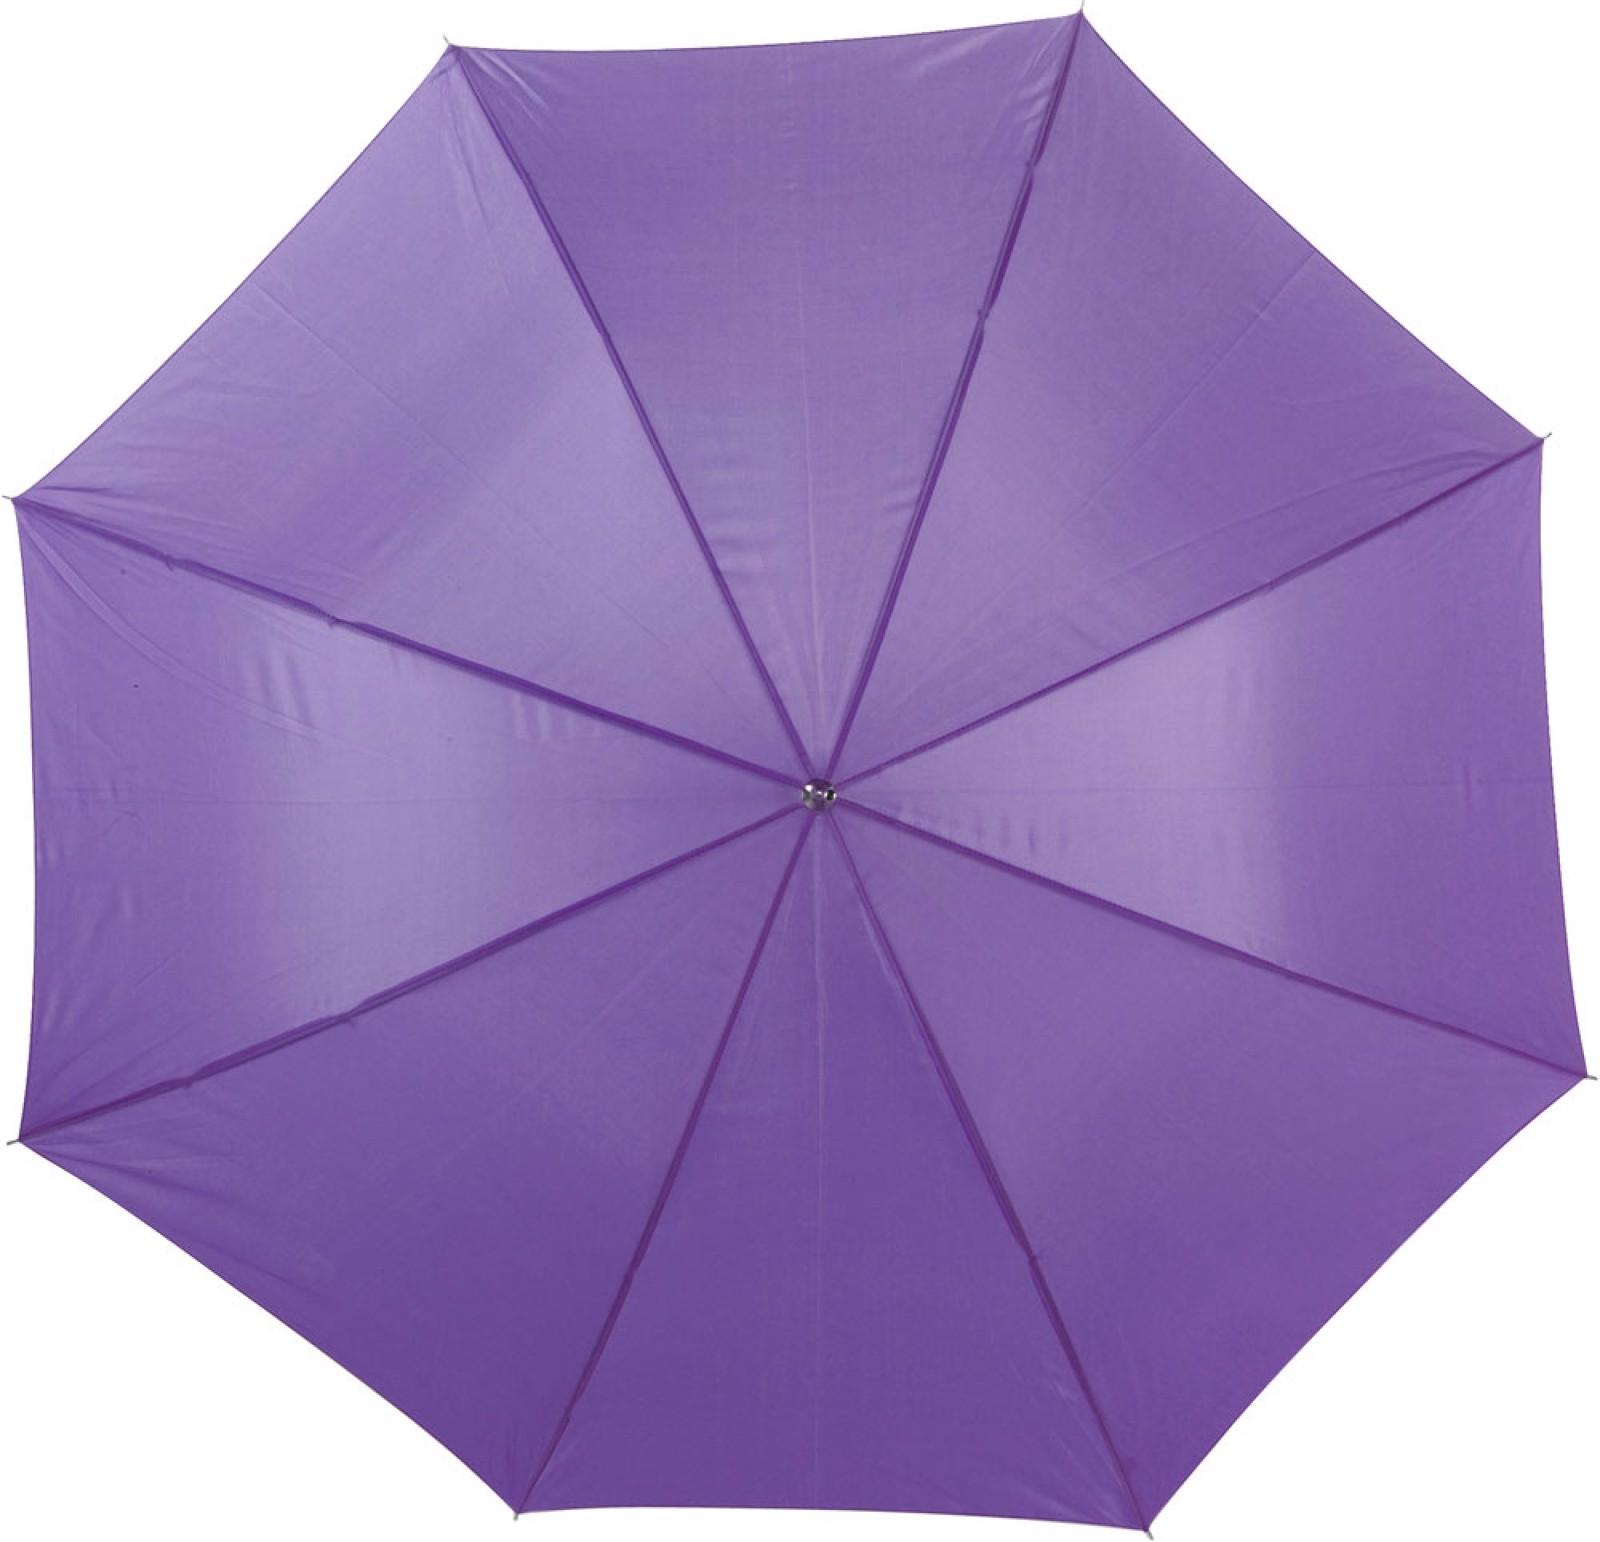 Polyester (190T) umbrella - Purple